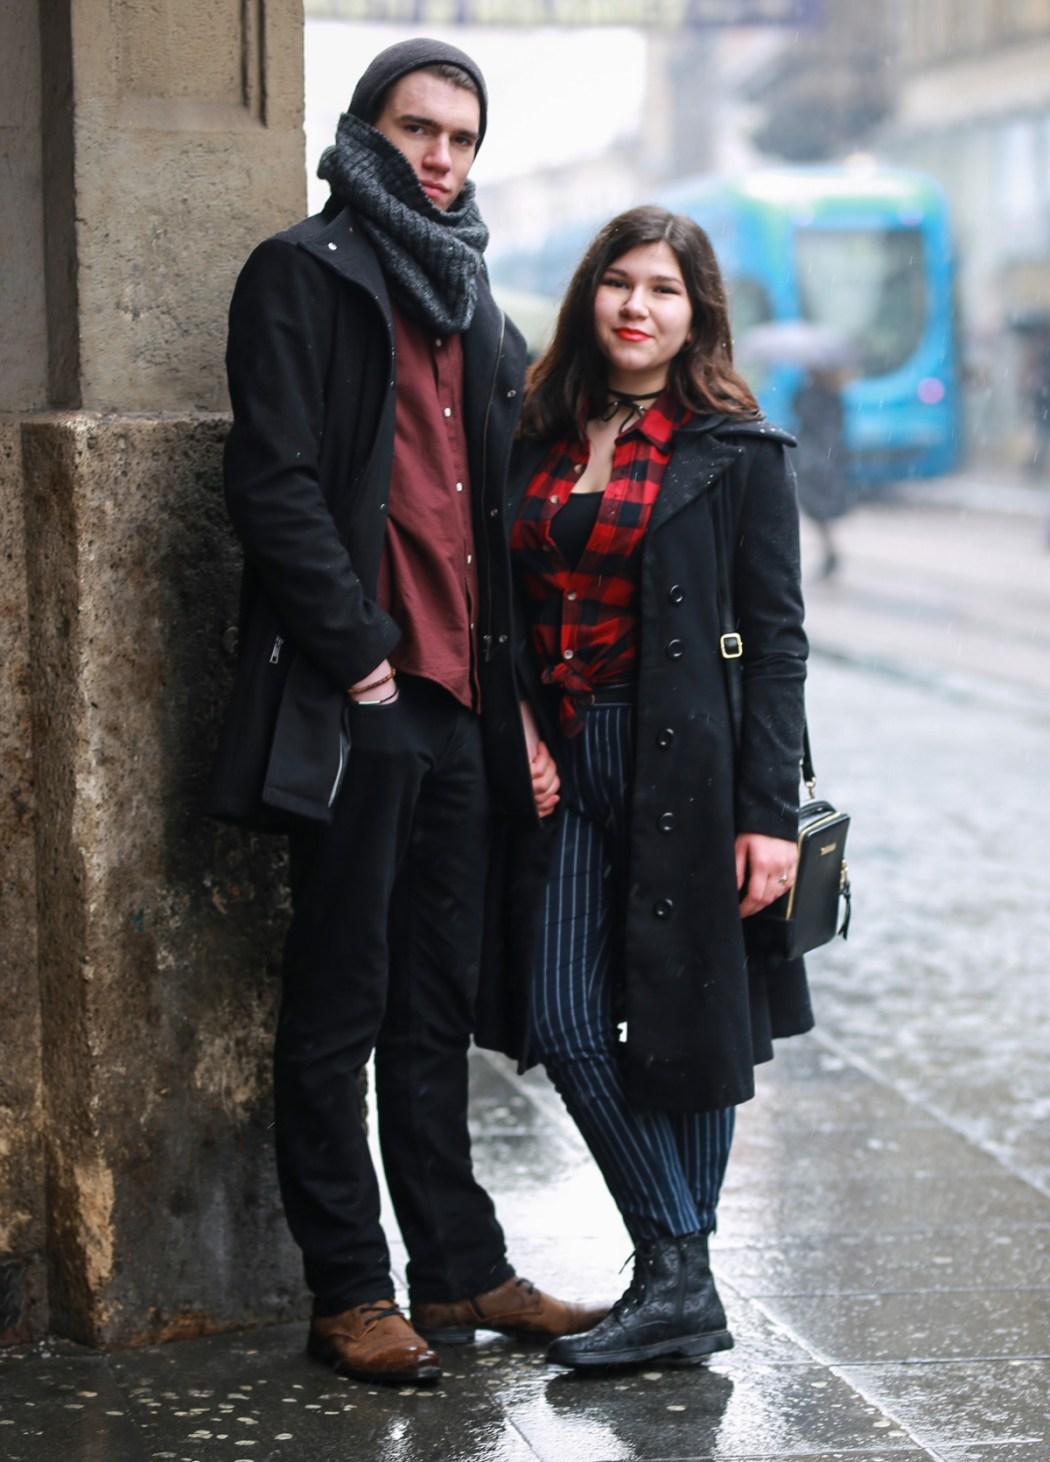 Fotka jednog poljupca na Trgu, crveni ruž i totalno romantična priča